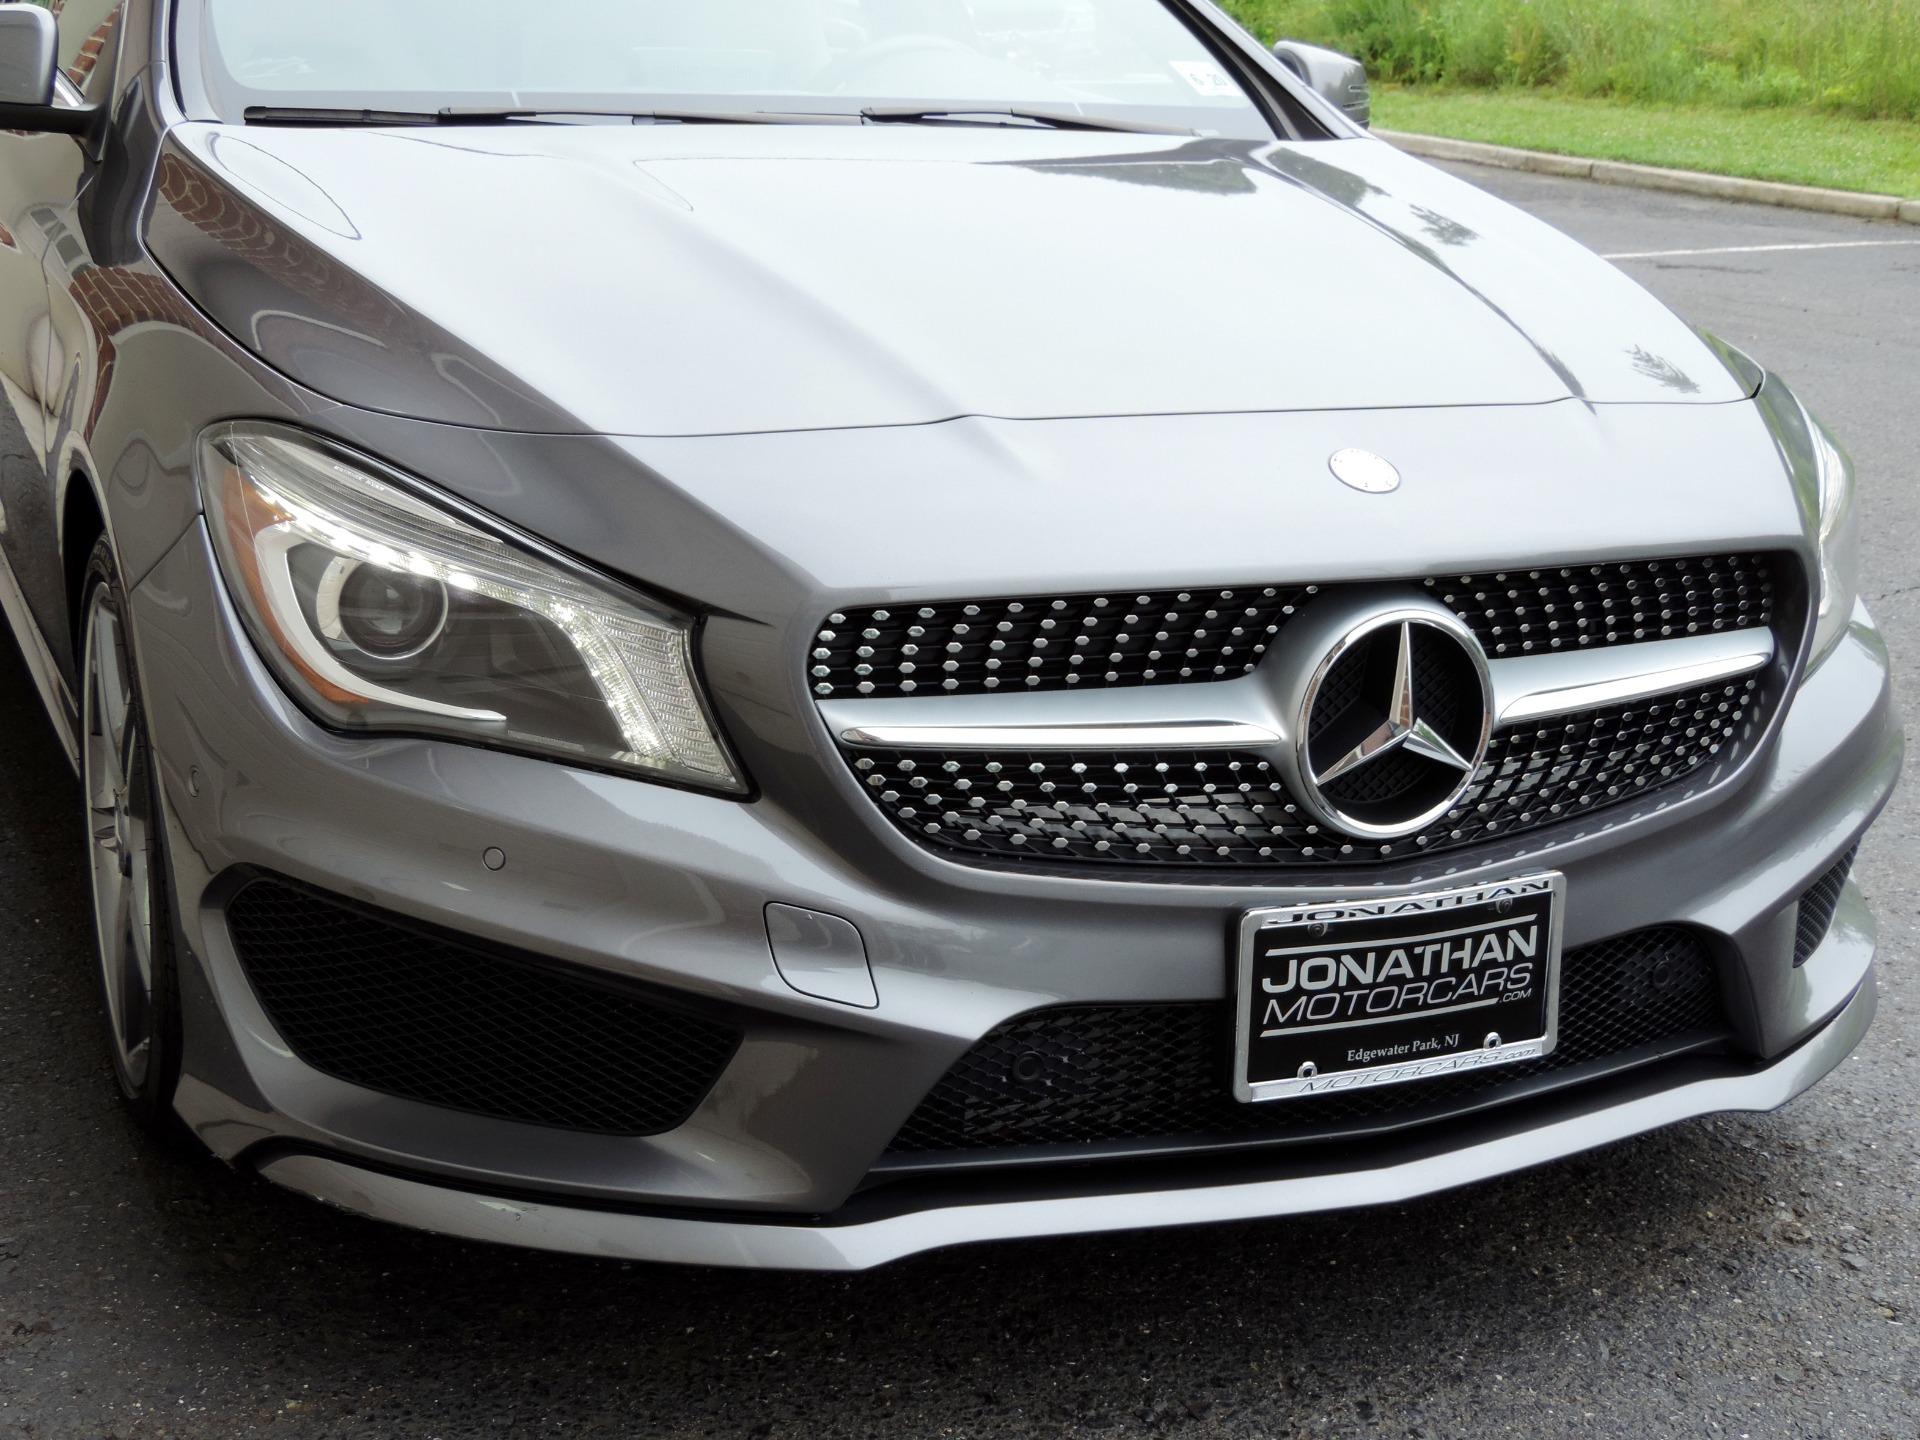 Used-2015-Mercedes-Benz-CLA-CLA-250-4MATIC